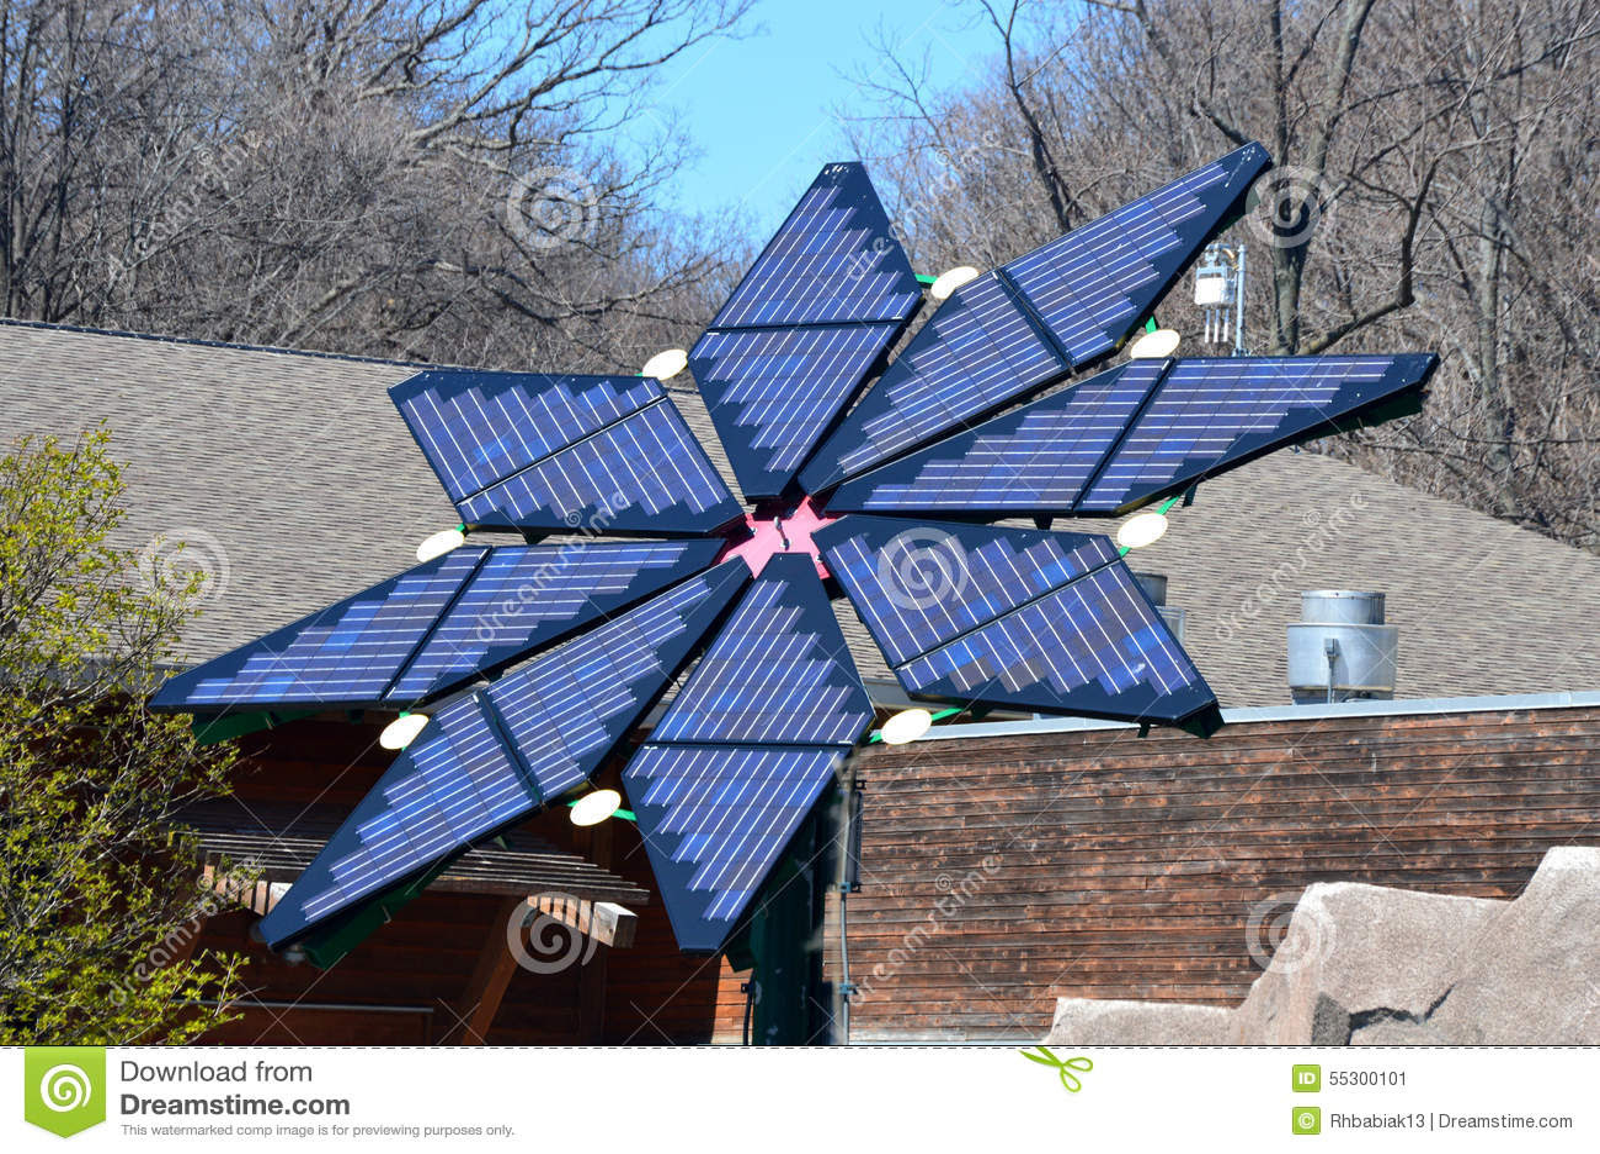 solar panels form shape flower milwaukee county zoo milwaukee wisconsin 55300101